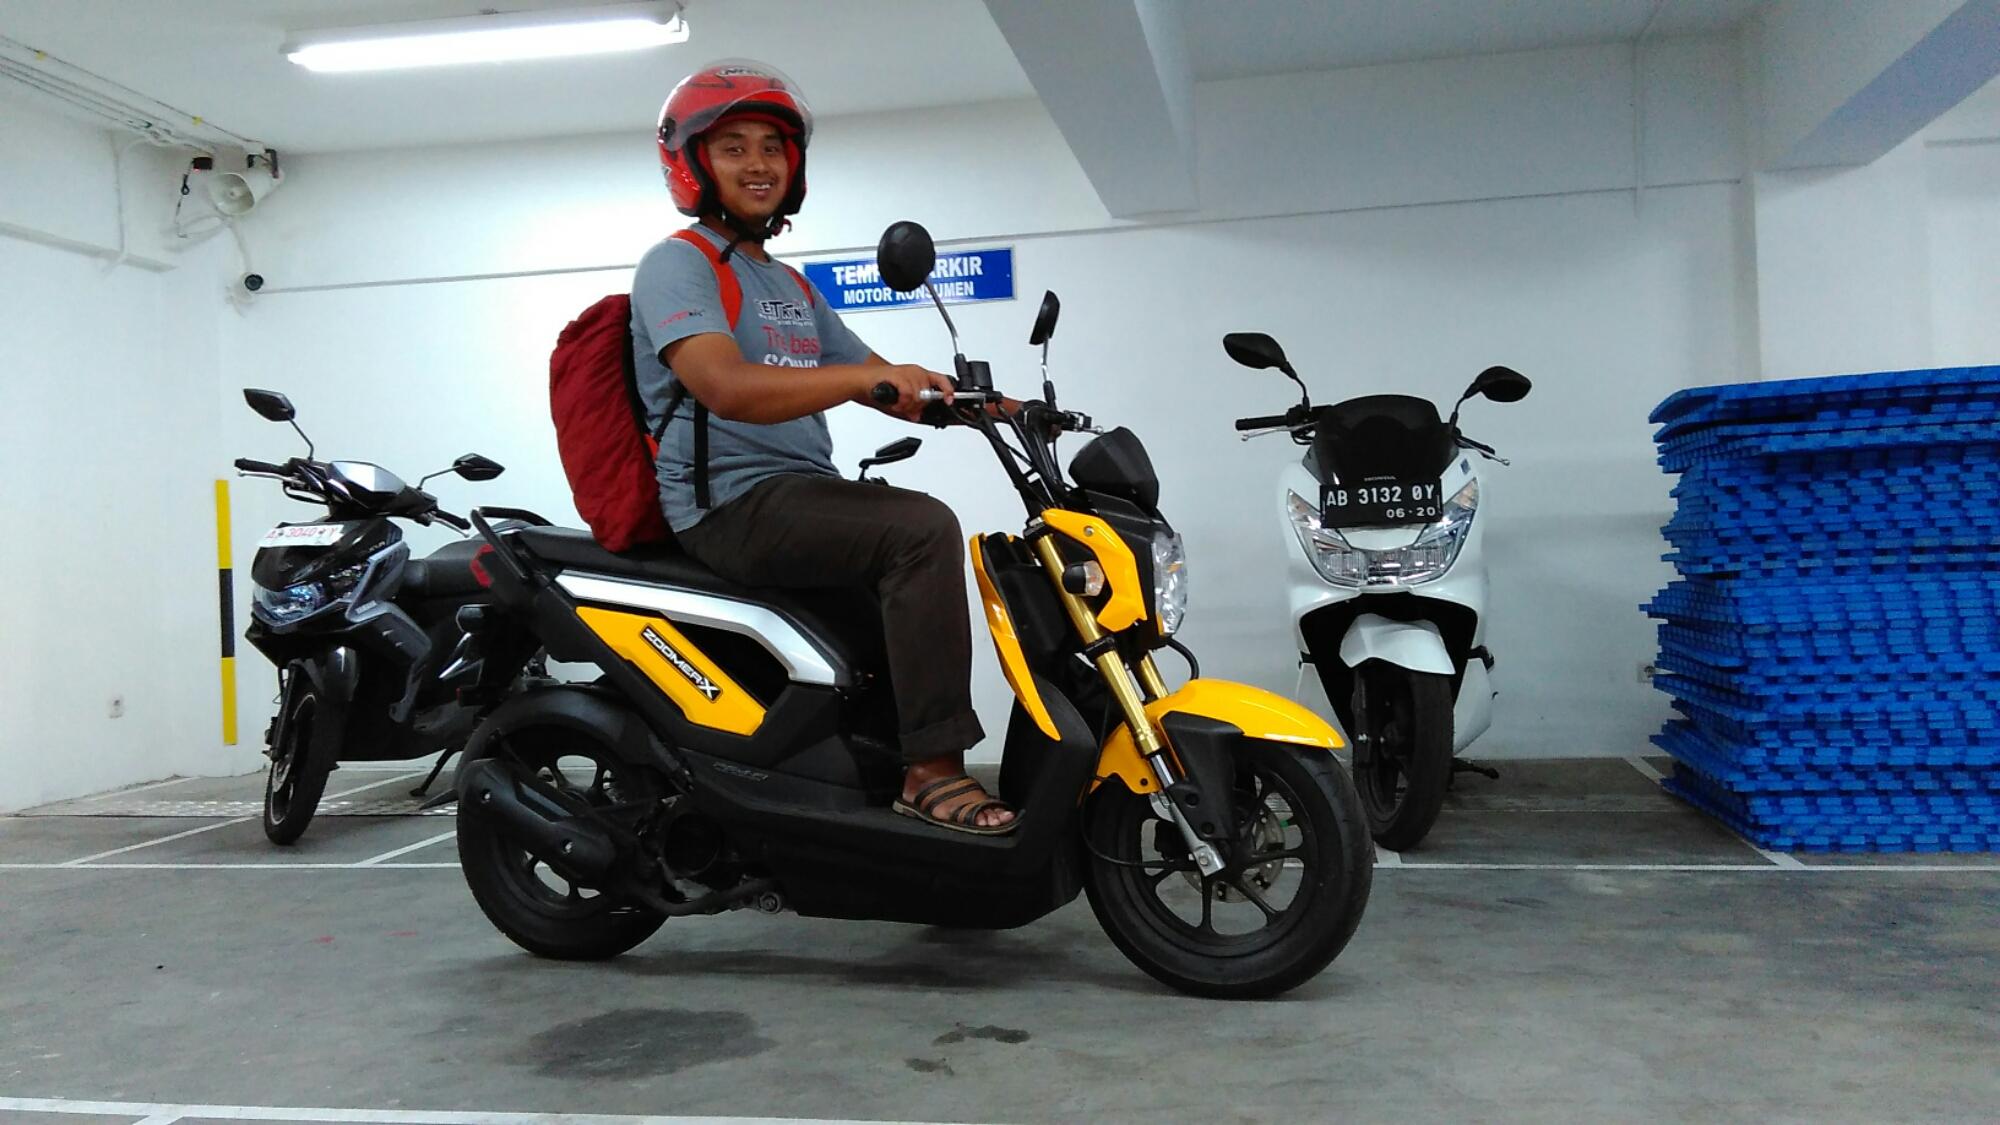 Nemu Juga Honda Zoomer X Legal Street Di Jogja Azizyhorees Blog